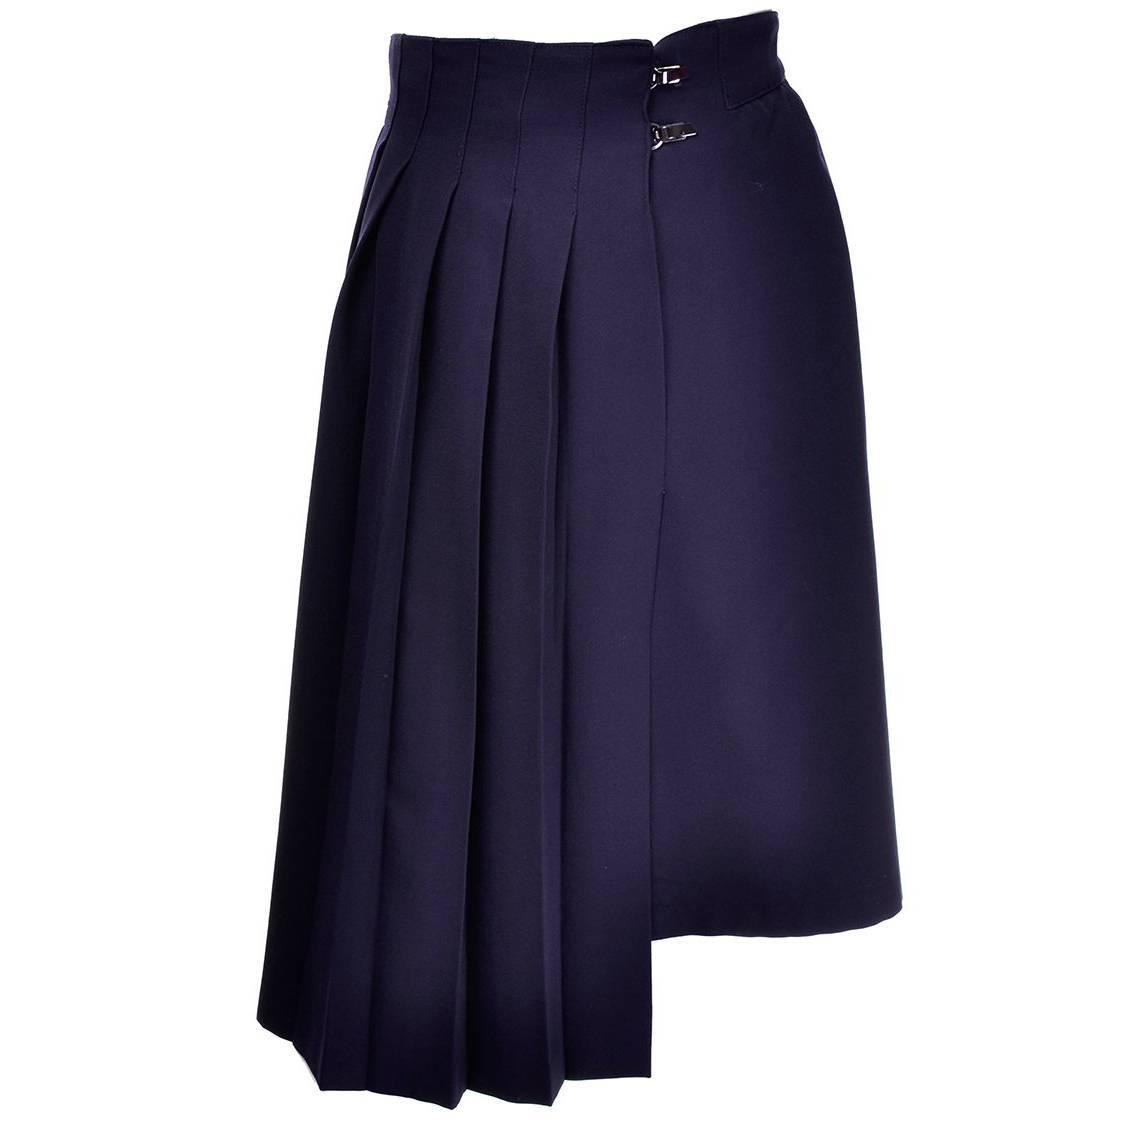 Claude Montana Vintage Black Avant Garde Car Wash Pleated Petal Skirt Navy Blue Wool Size 14